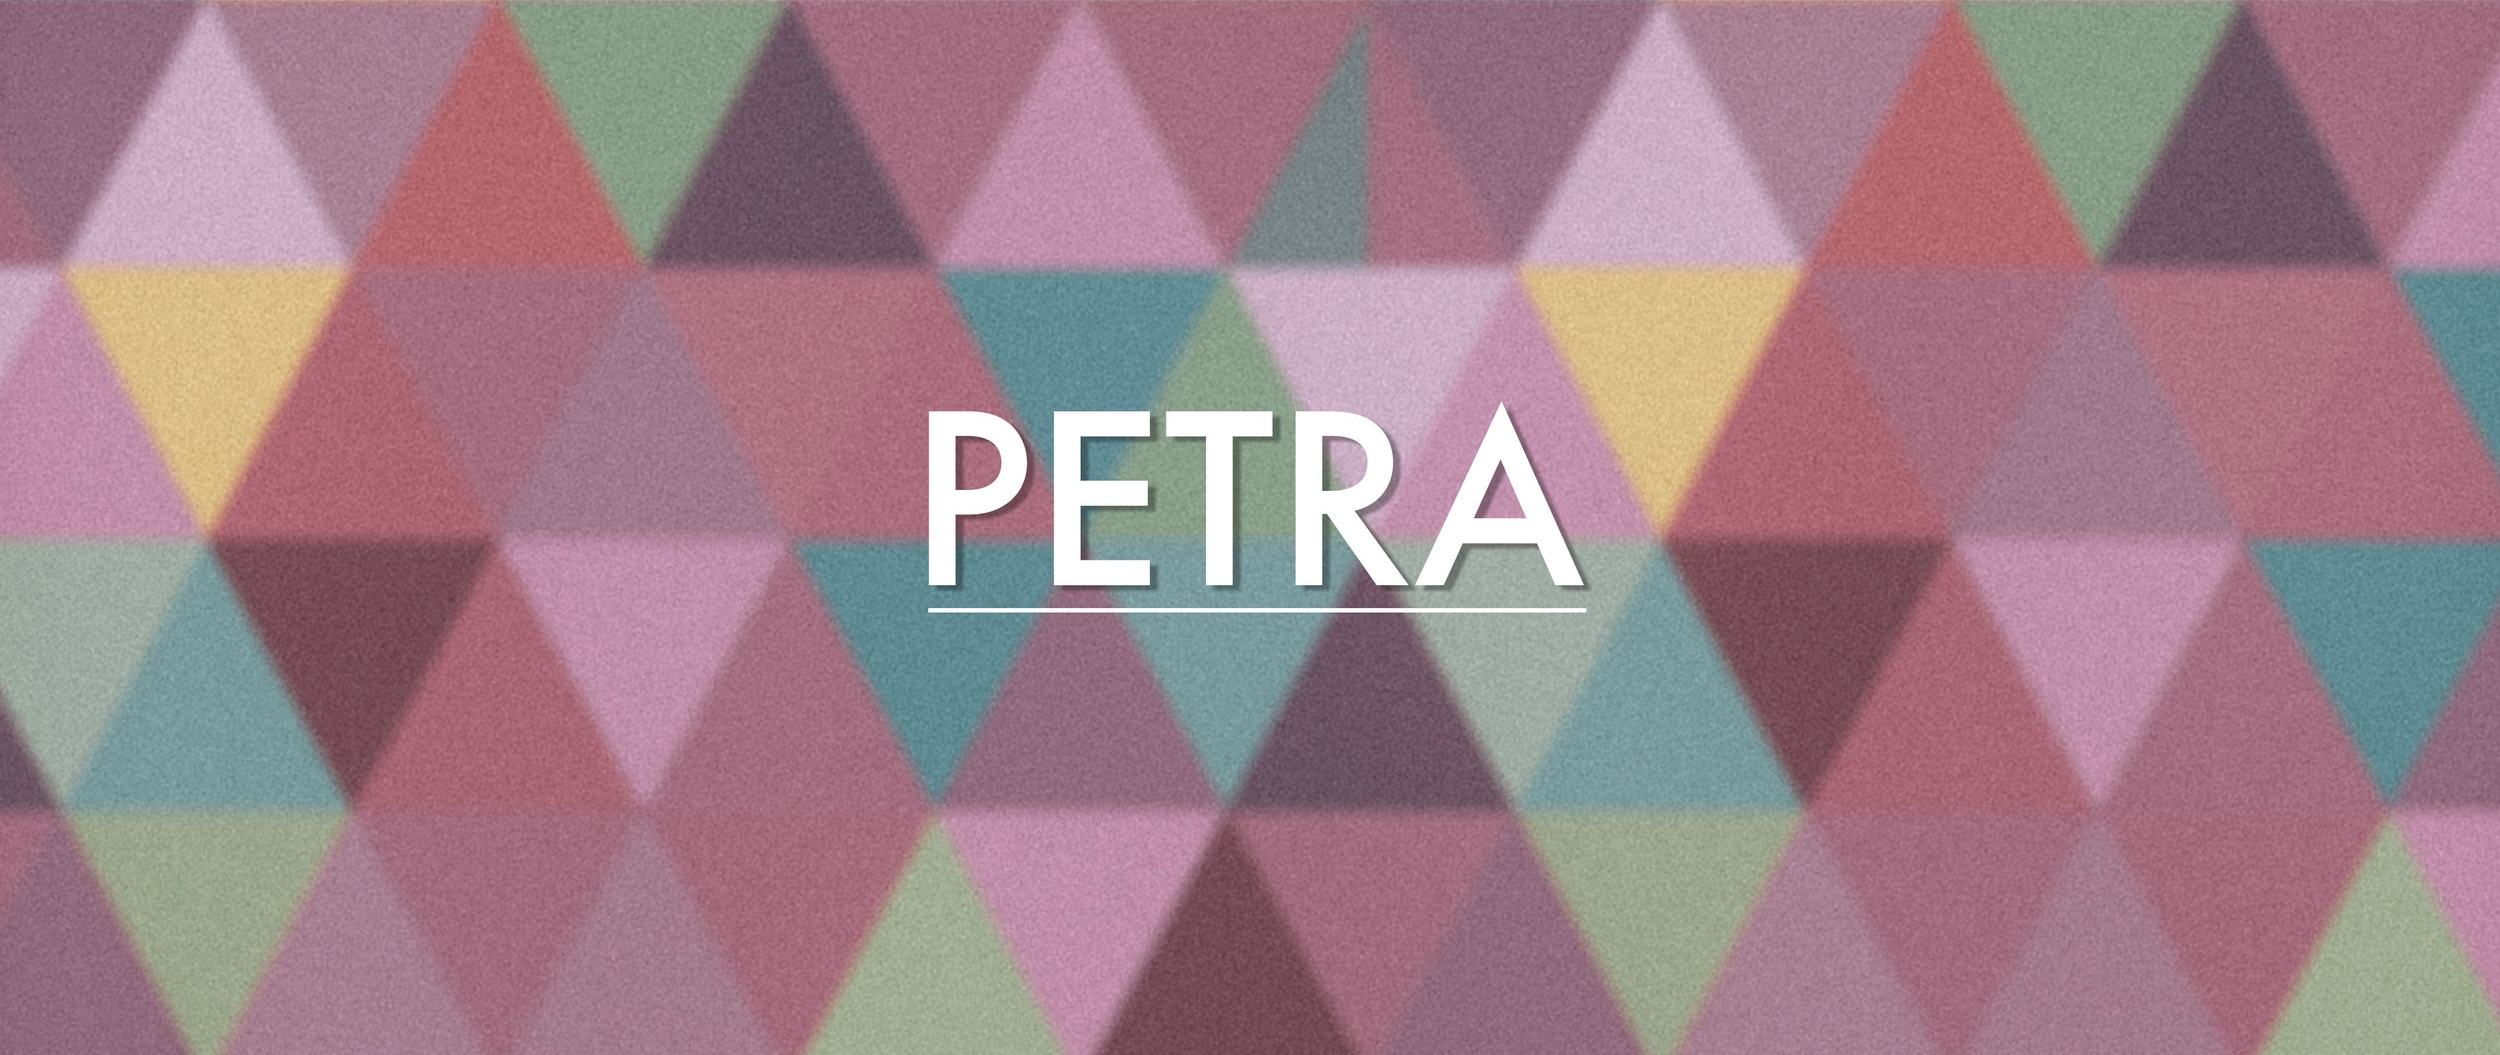 petra-intro.jpg